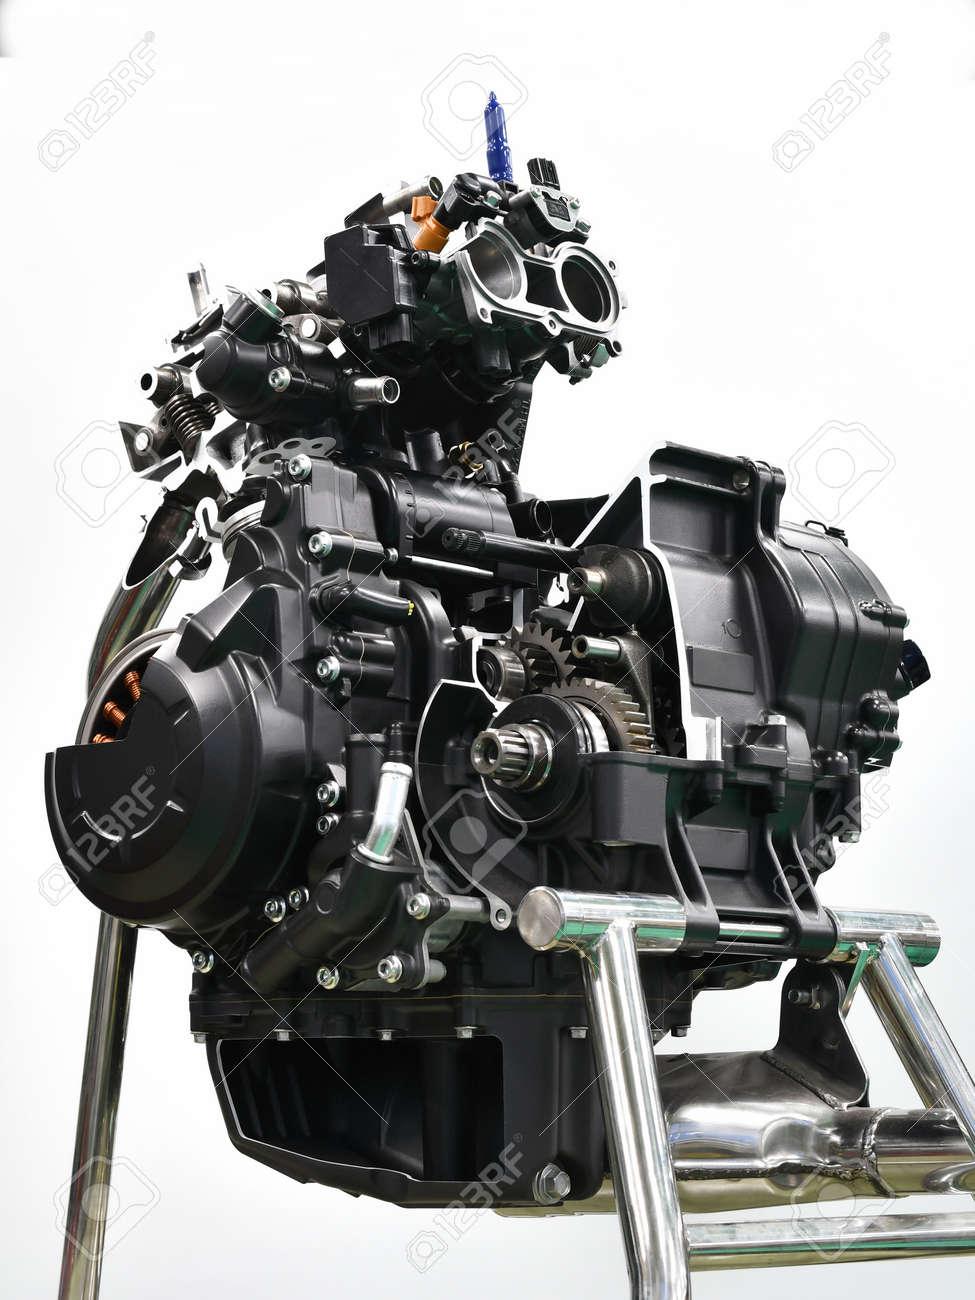 Bike Engine Cut Model - 169410059